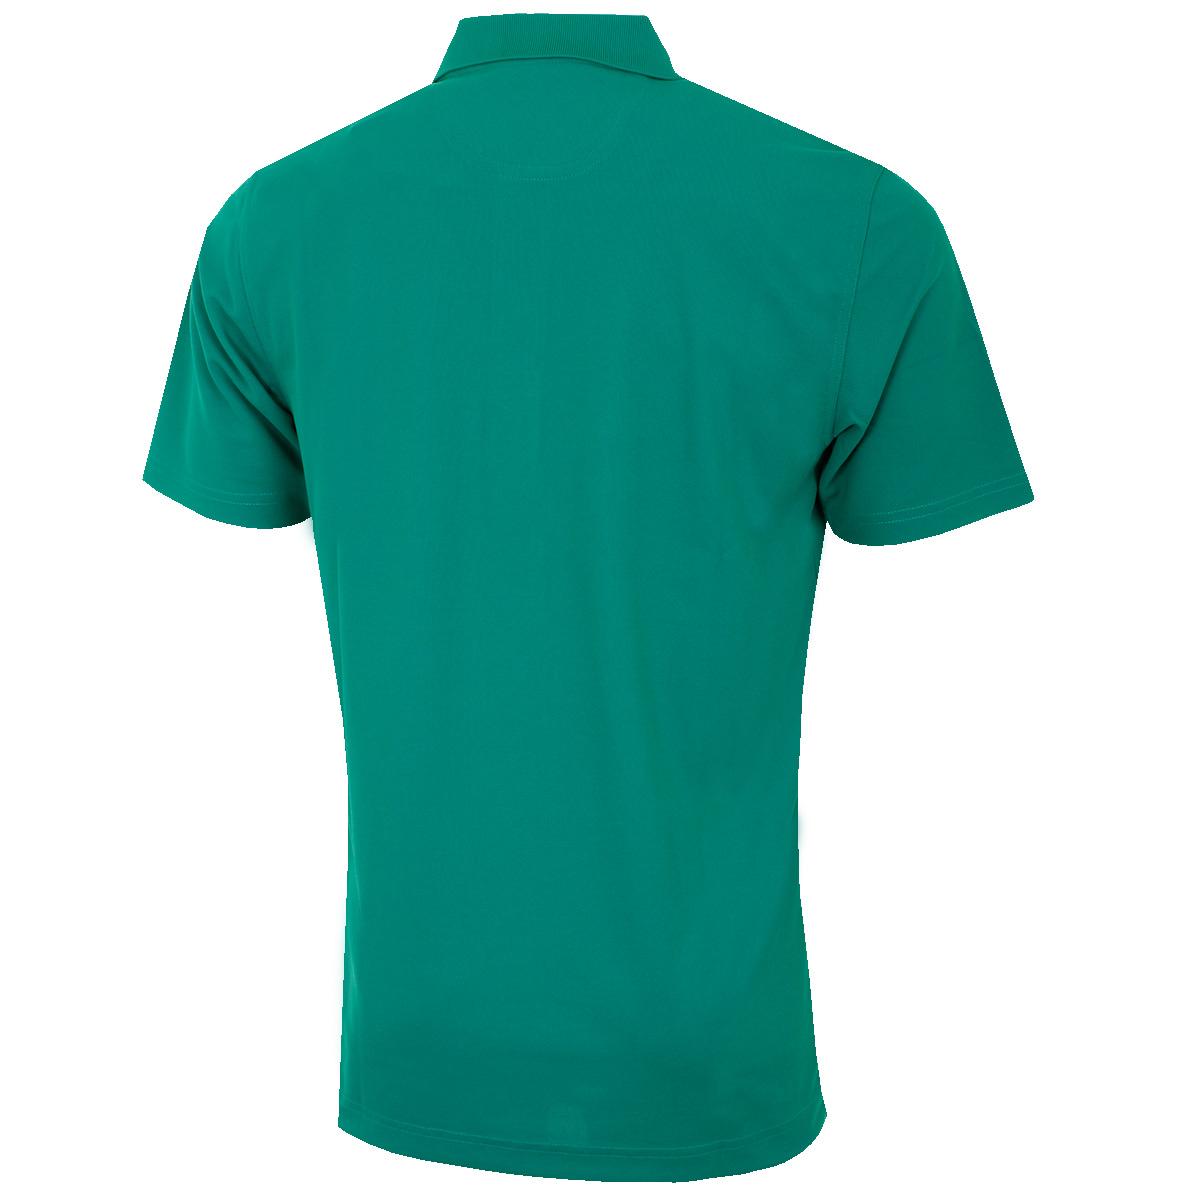 Greg-Norman-Mens-KX04-Performance-Micro-Pique-Golf-Polo-Shirt-28-OFF-RRP thumbnail 29